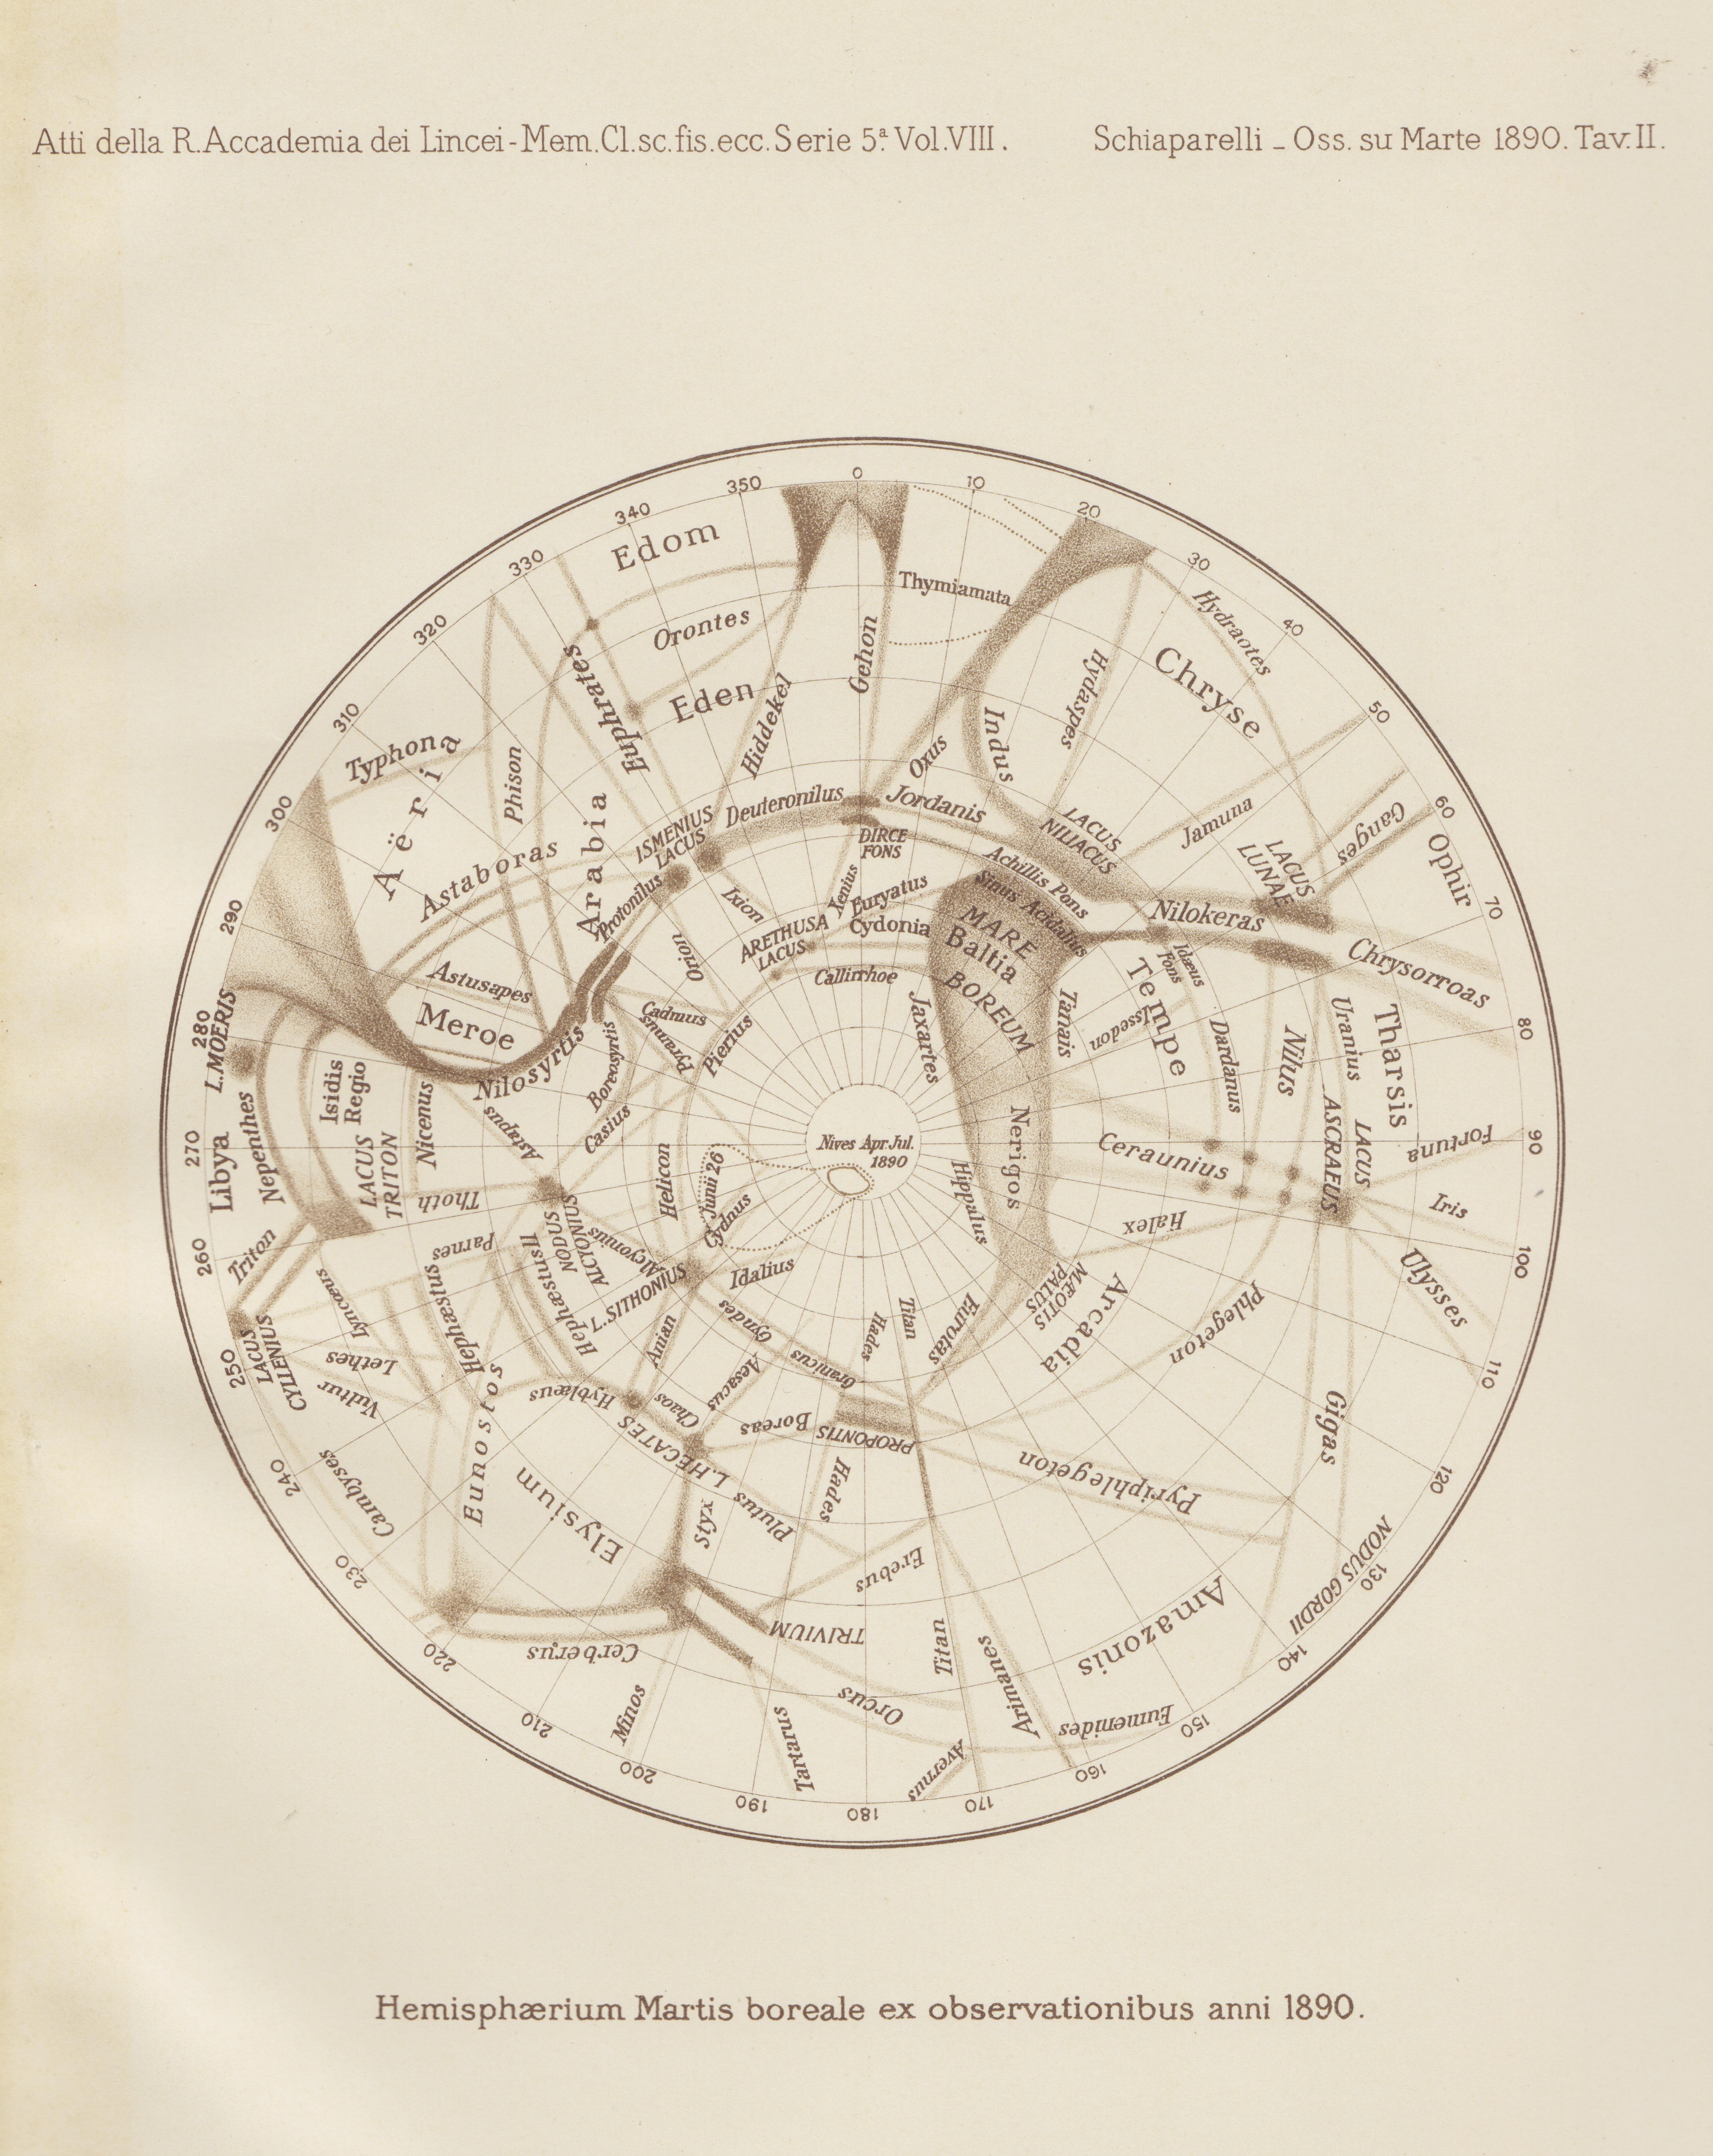 foto41_stereografia-emisfero-boreale_-1890brera